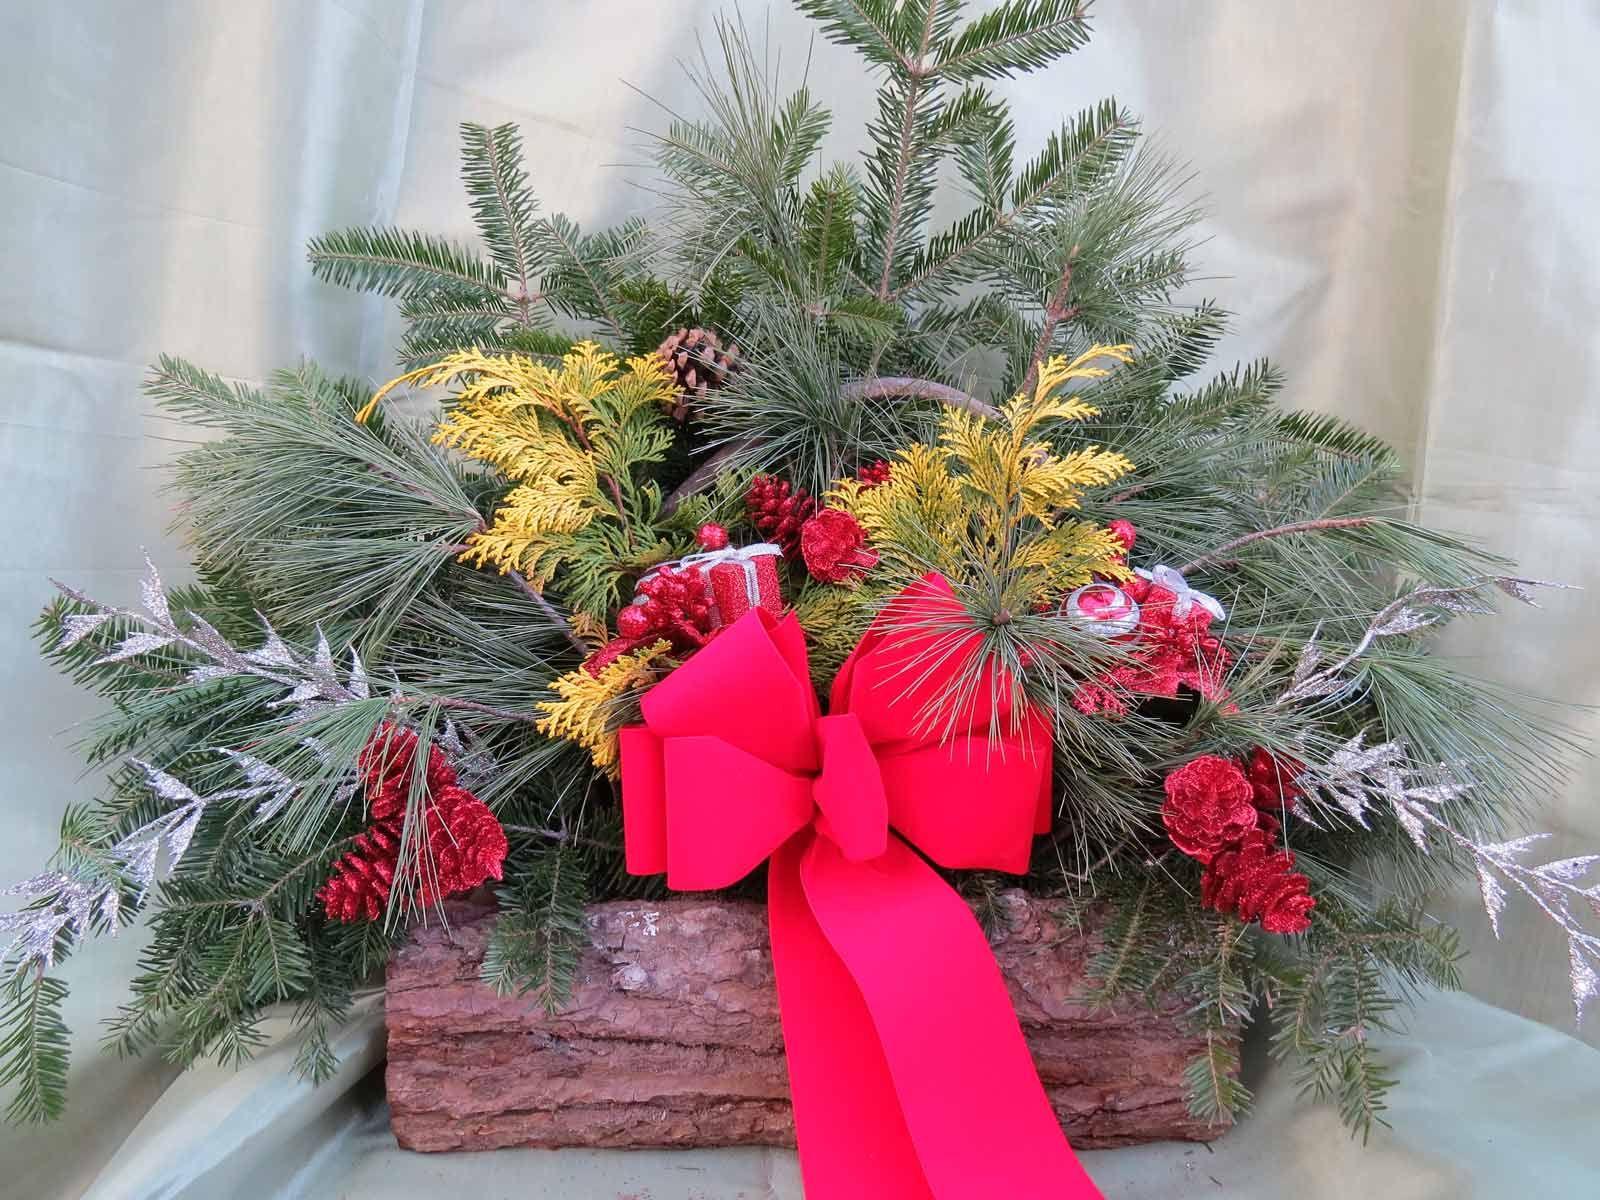 Custom Decorated Log - The Garden Barn Nursery, Vernon, CT ...